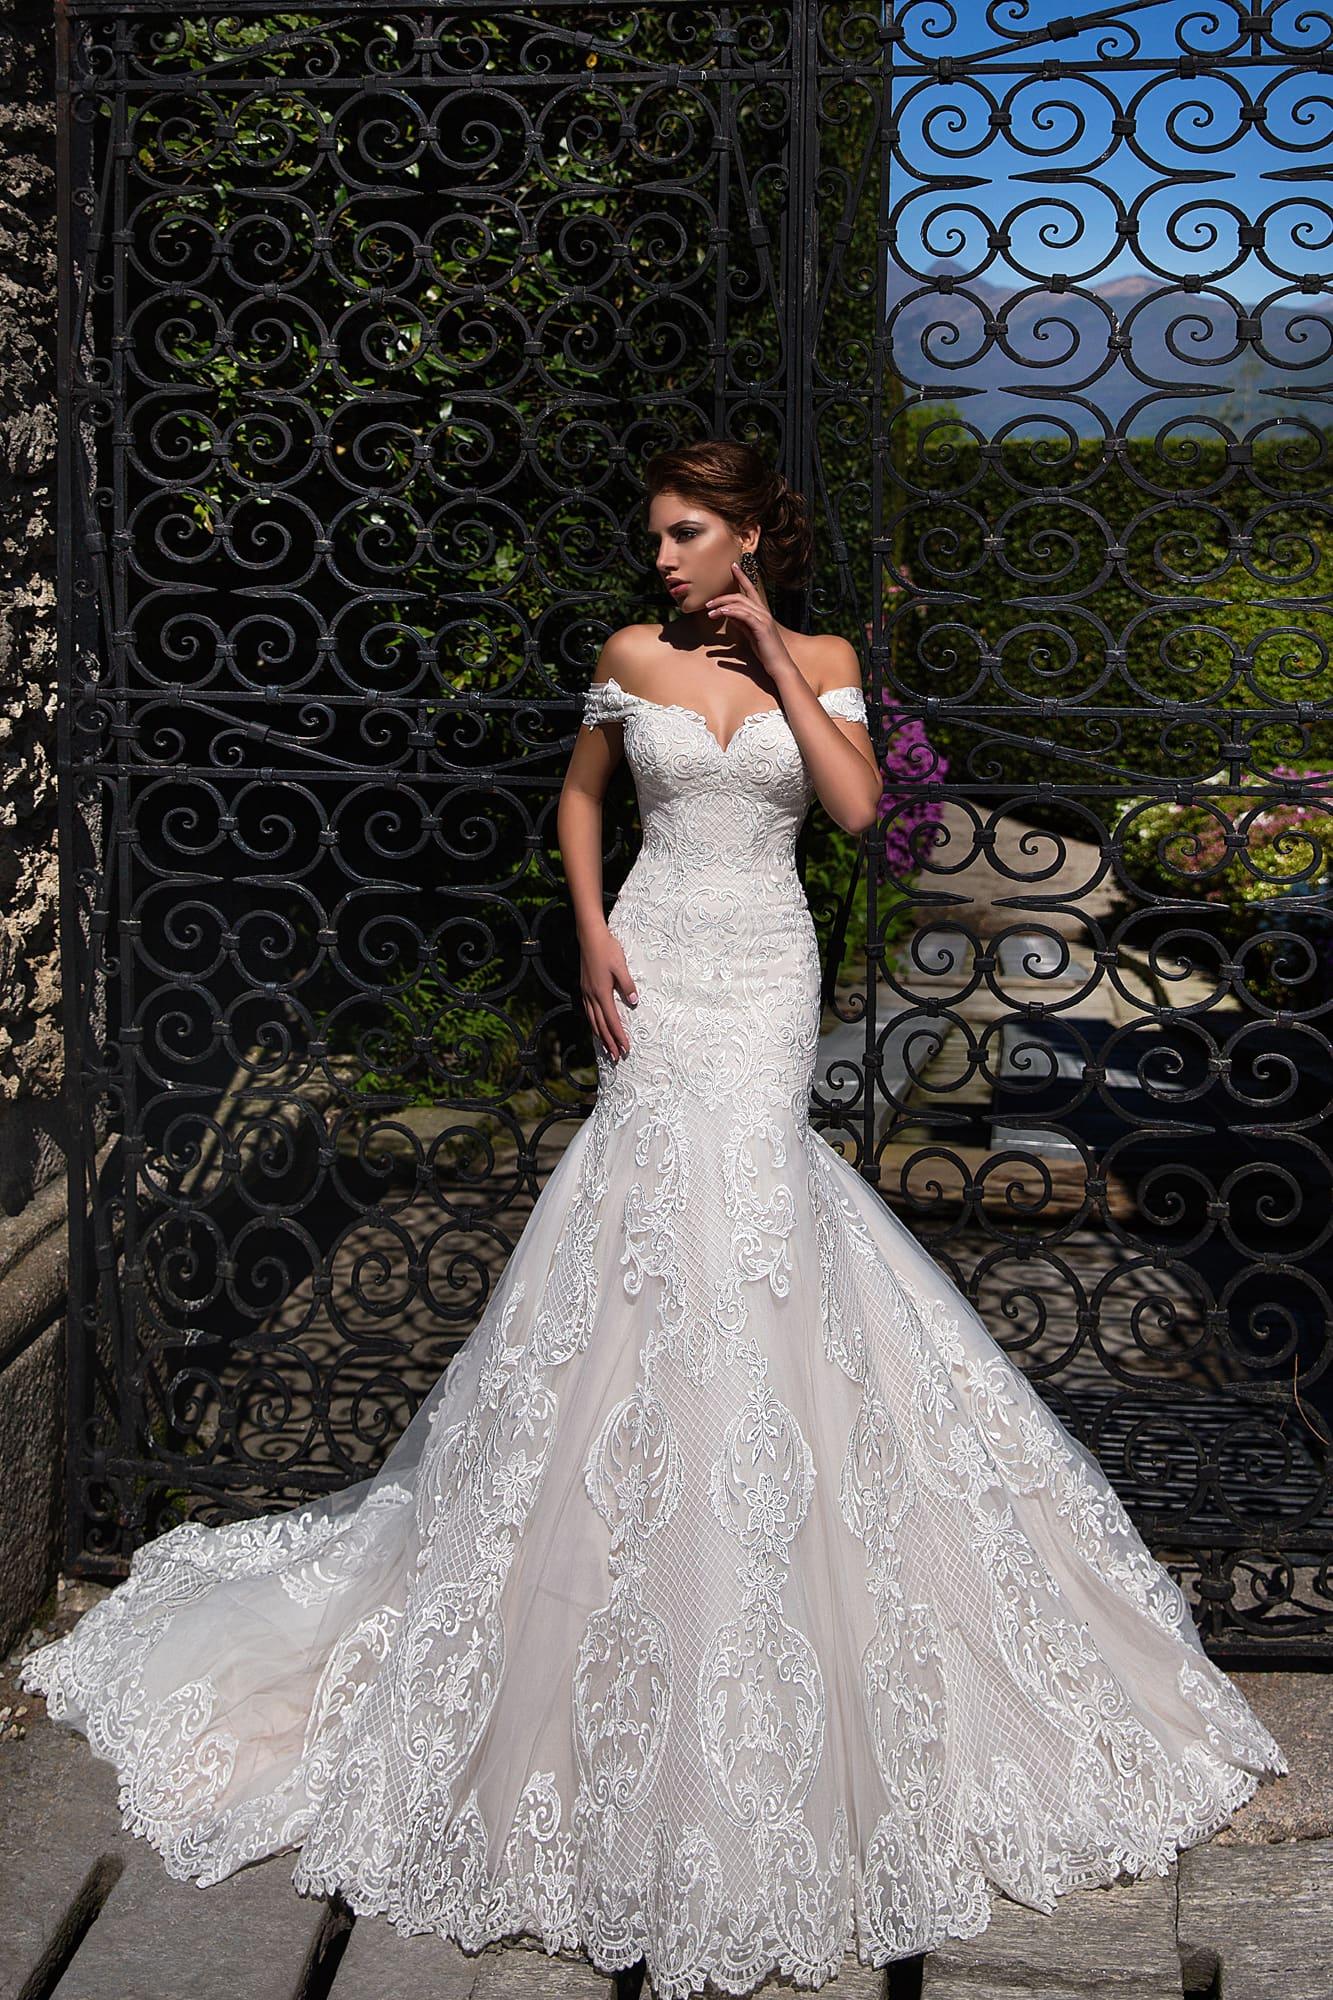 Image 2 - Off Shoulder Mermaid Wedding Dress 2020 Lace Up Back Appliqued Tulle Wedding Gowns Bride Dress Lace Wedding Dress MariageWedding Dresses   -